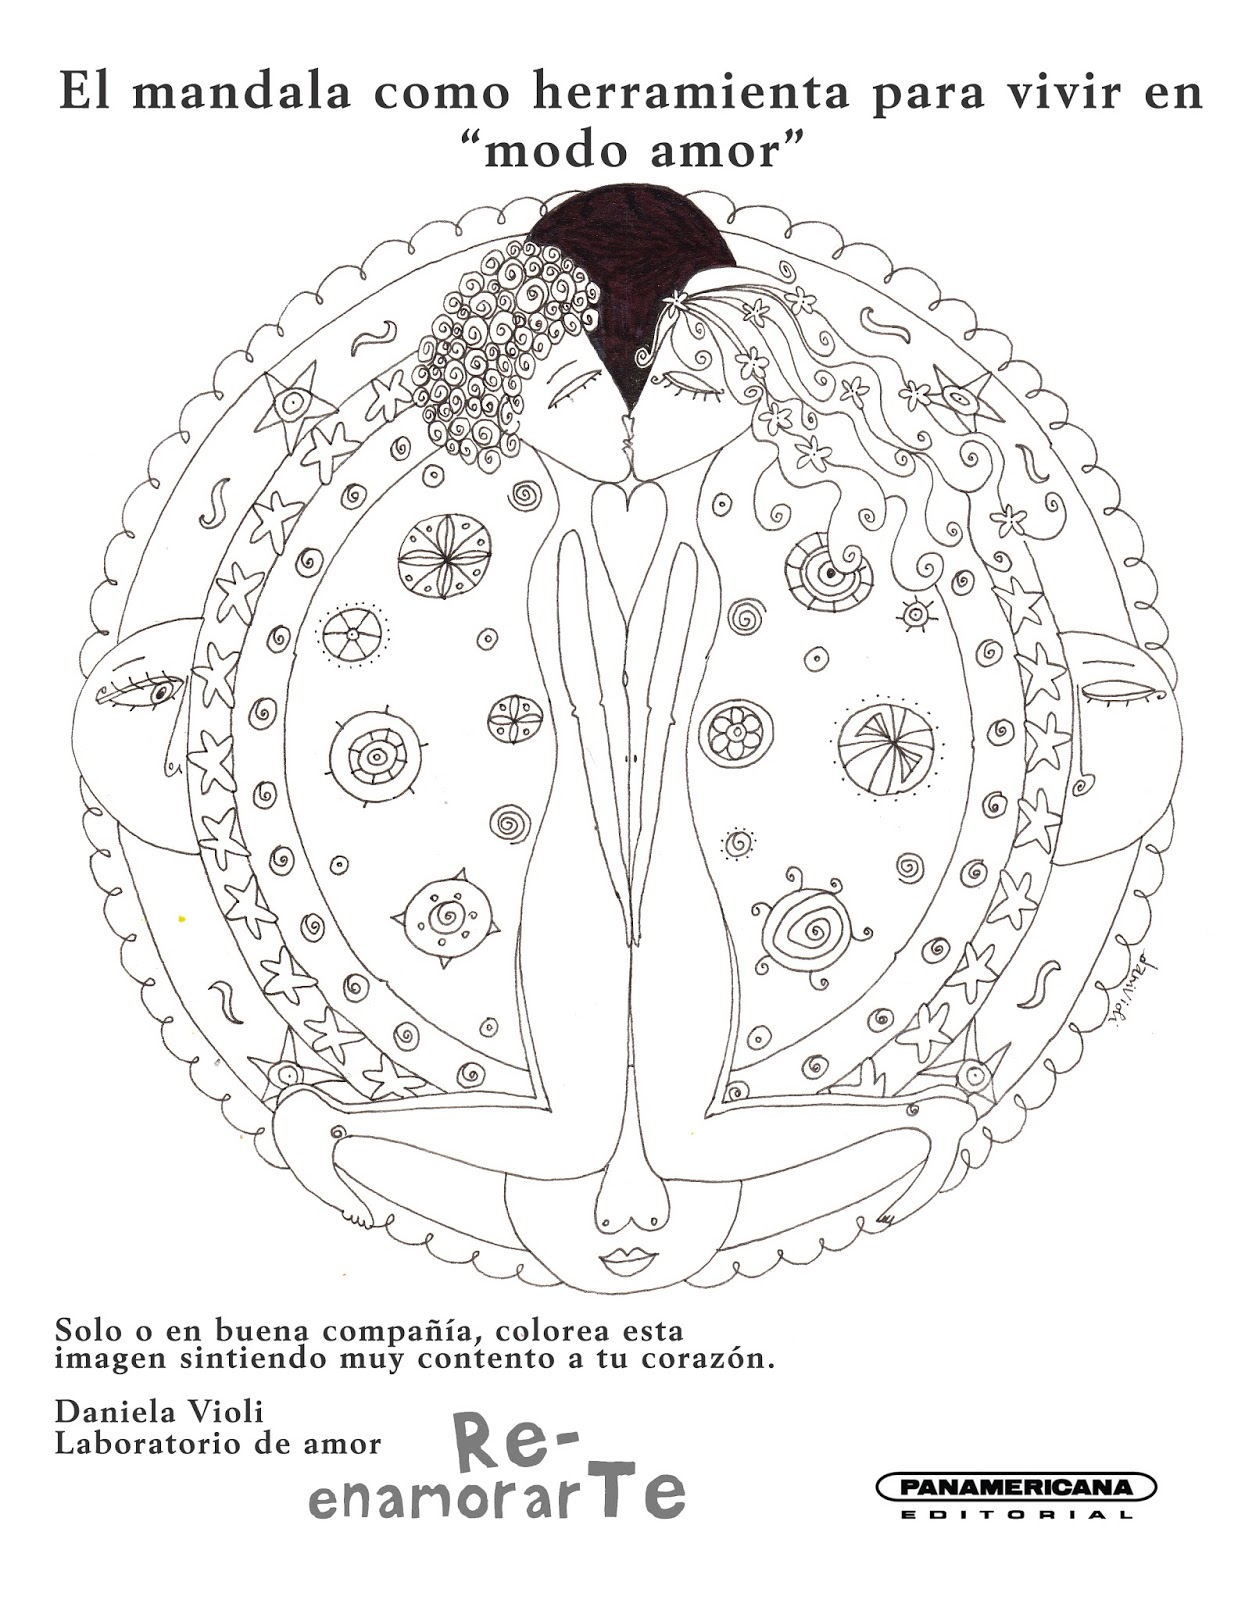 Mandala Para Atraer El Amor Reenamorarte De Daniela Violi Con